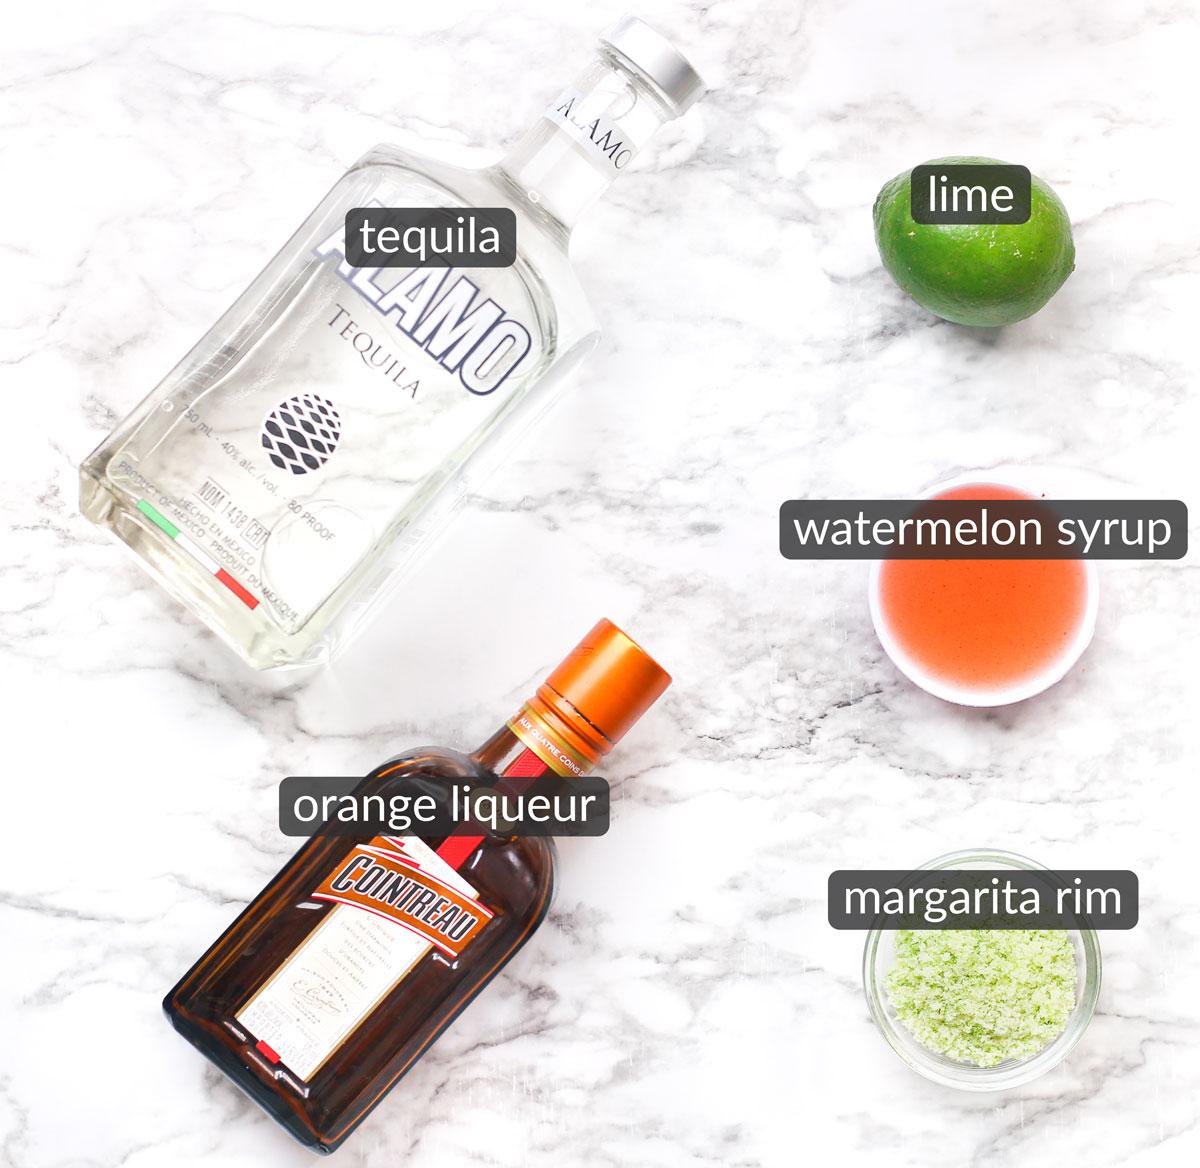 ingredients used to make watermelon margarita